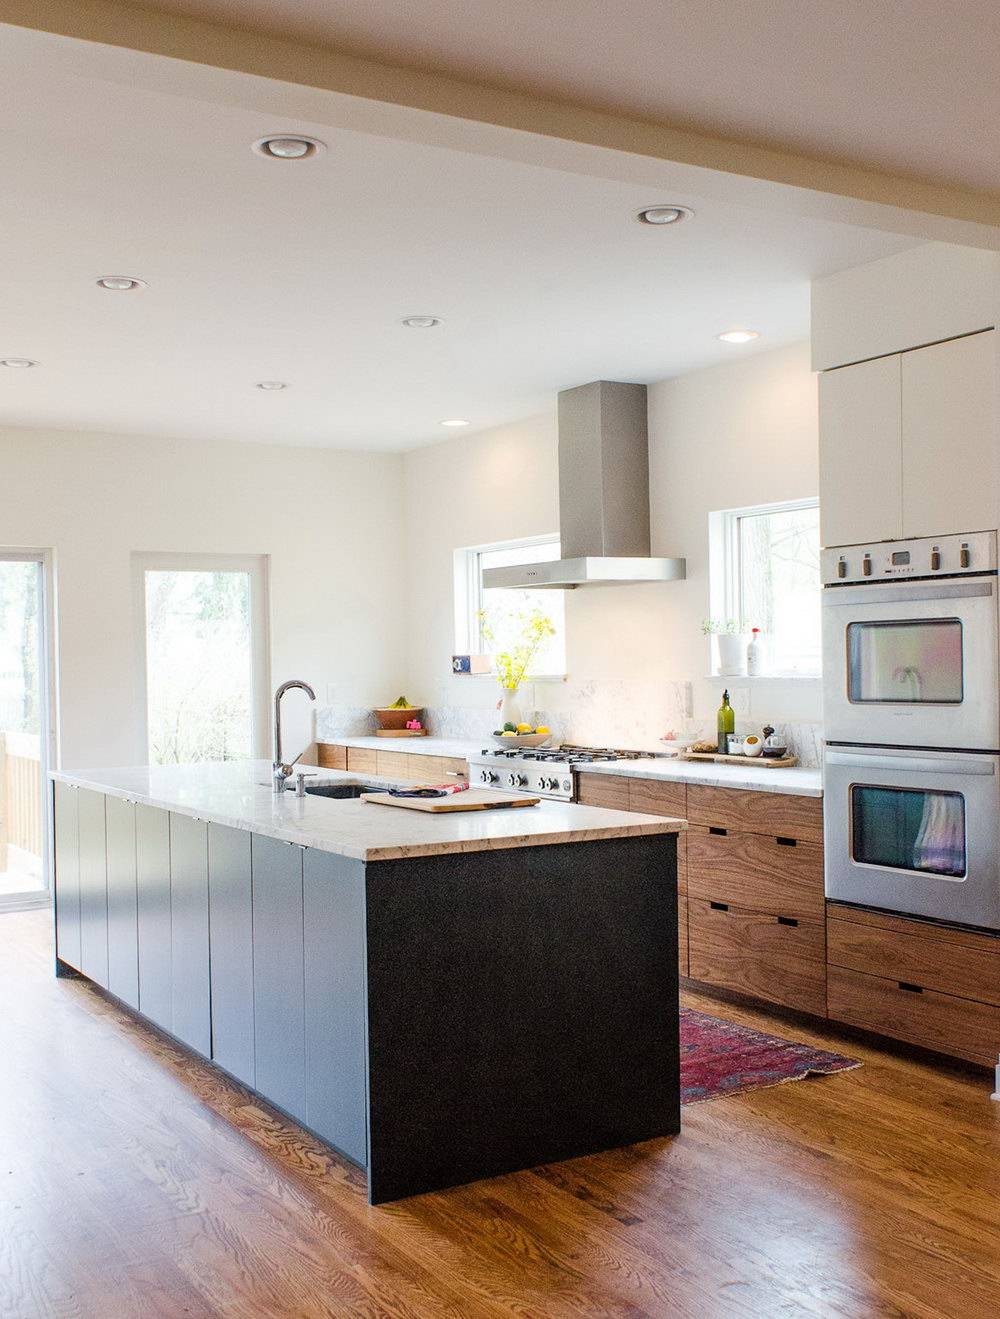 Ikea Kitchen Cabinet Reviews 2017